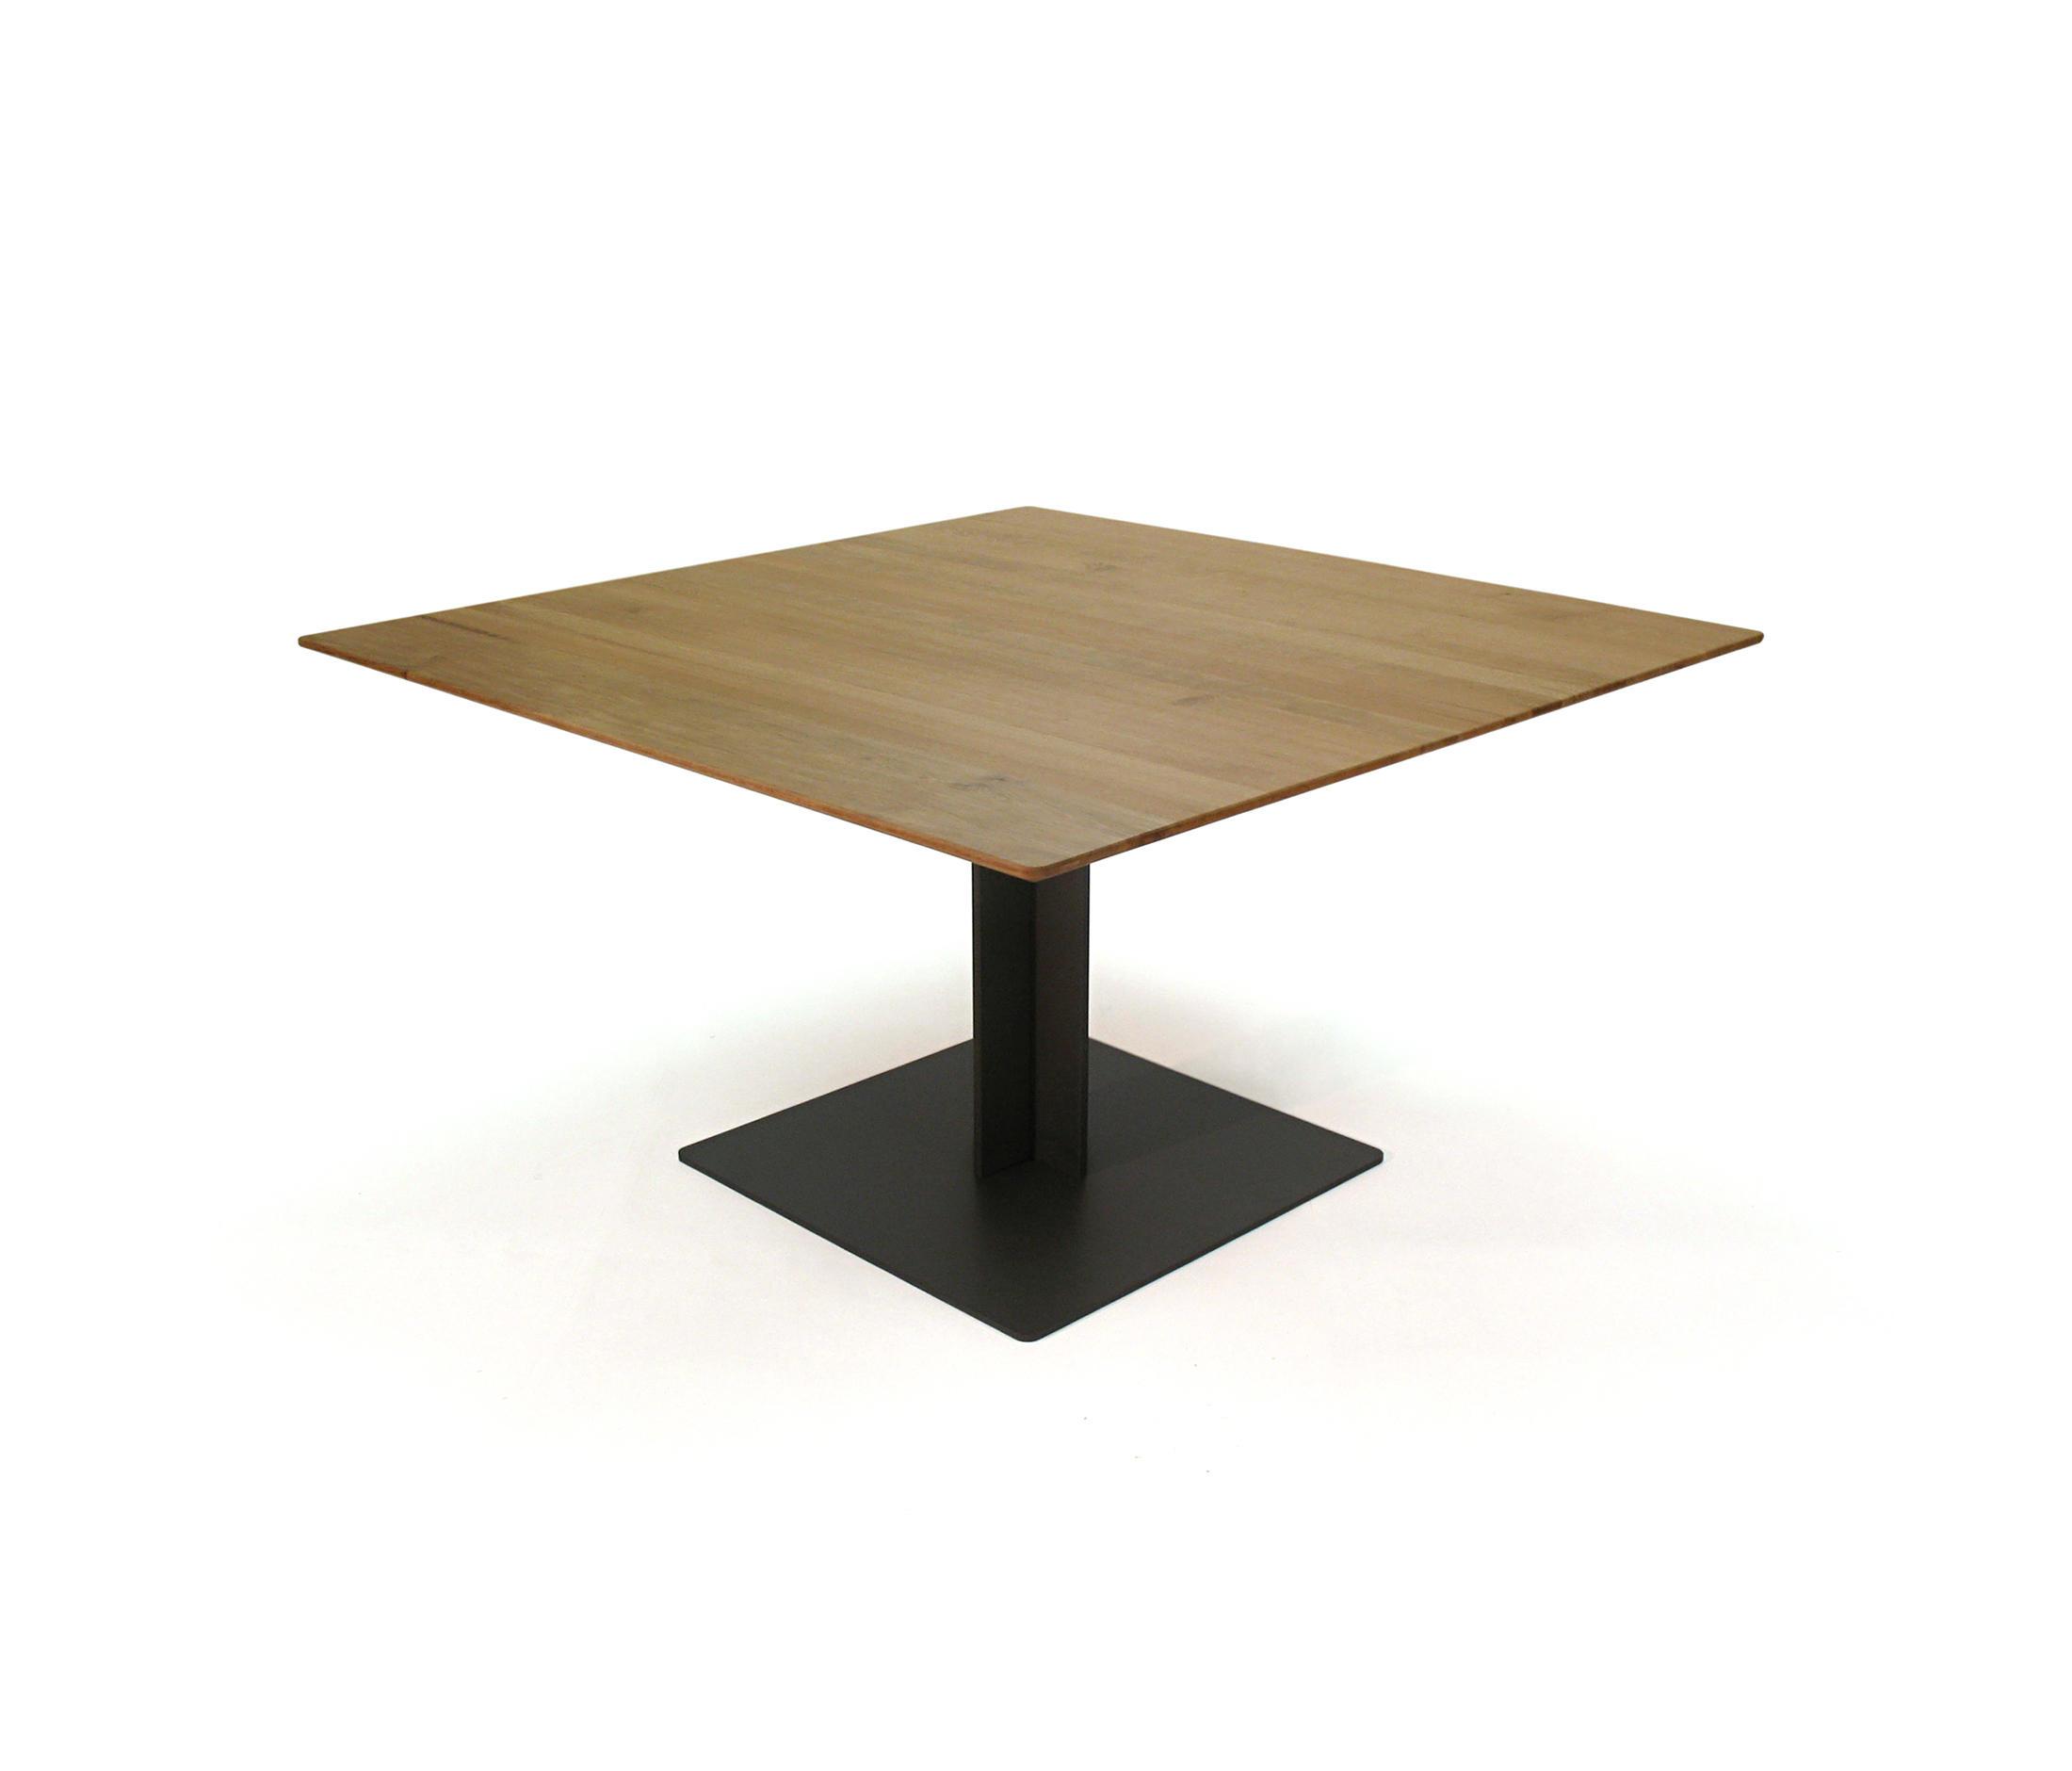 Square restaurant tables - Central Park Cafeteria Tables Zinx